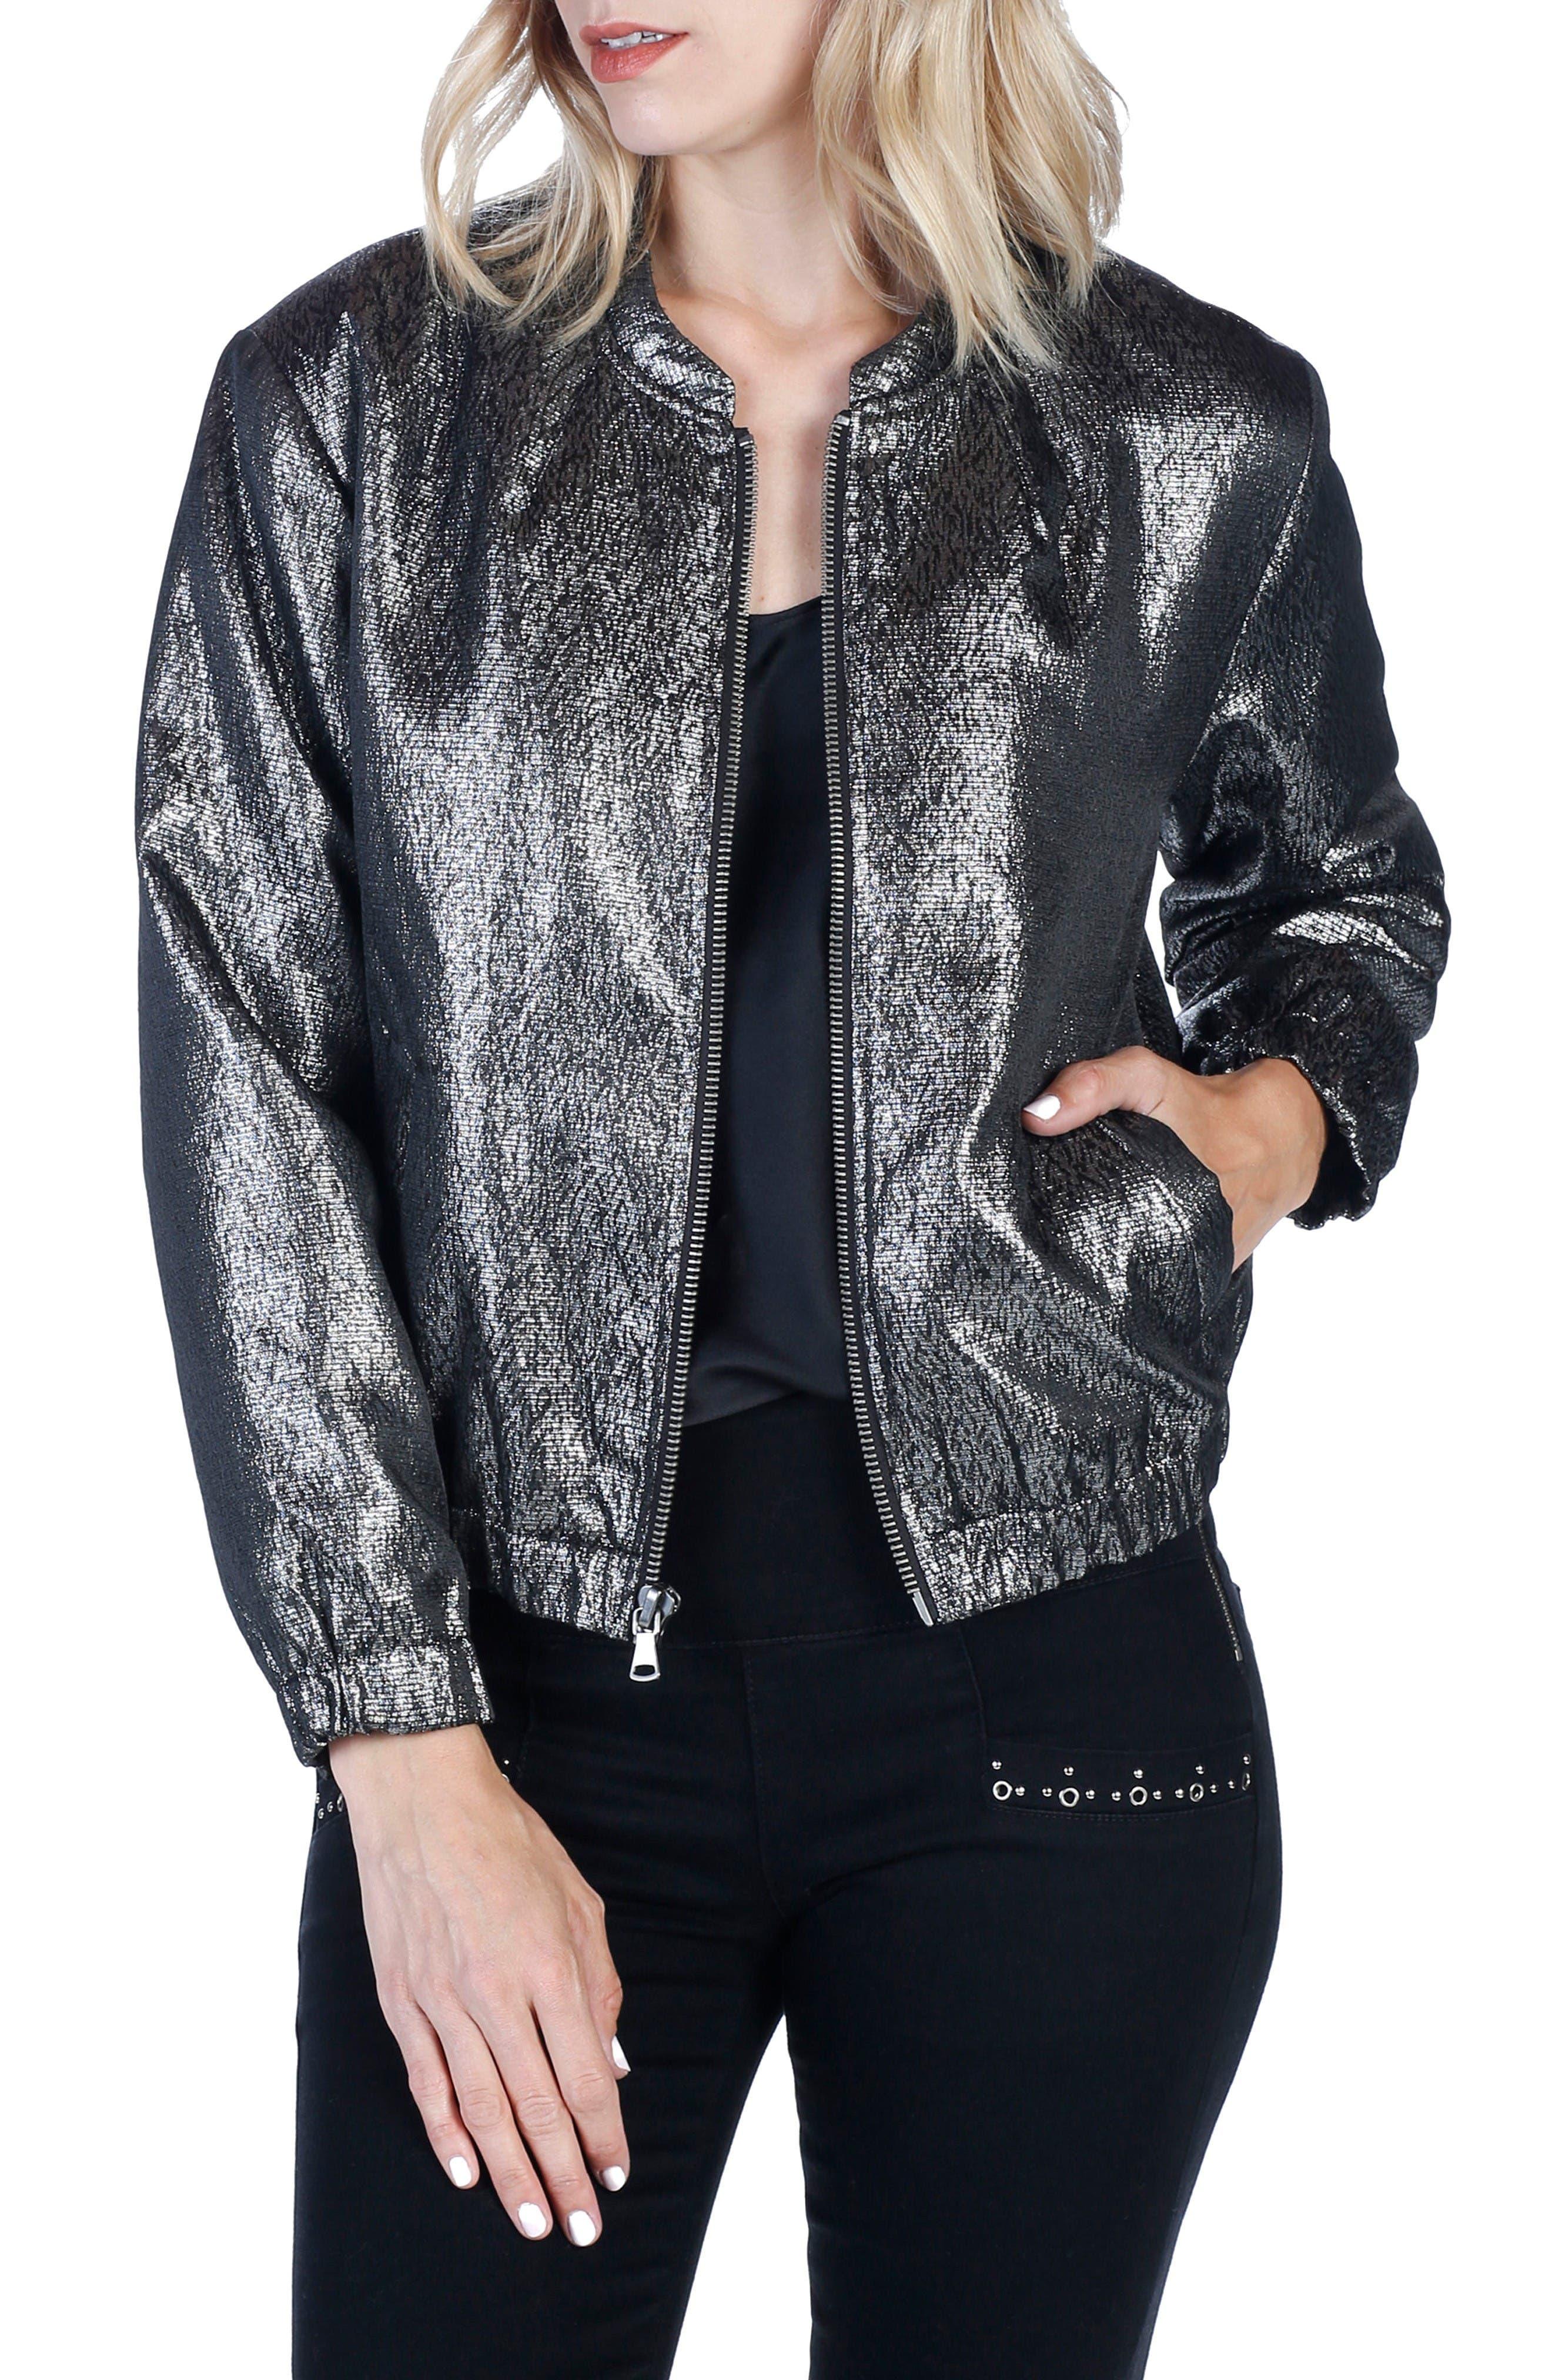 Main Image - Rosie HW x PAIGE Kimi Bomber Jacket